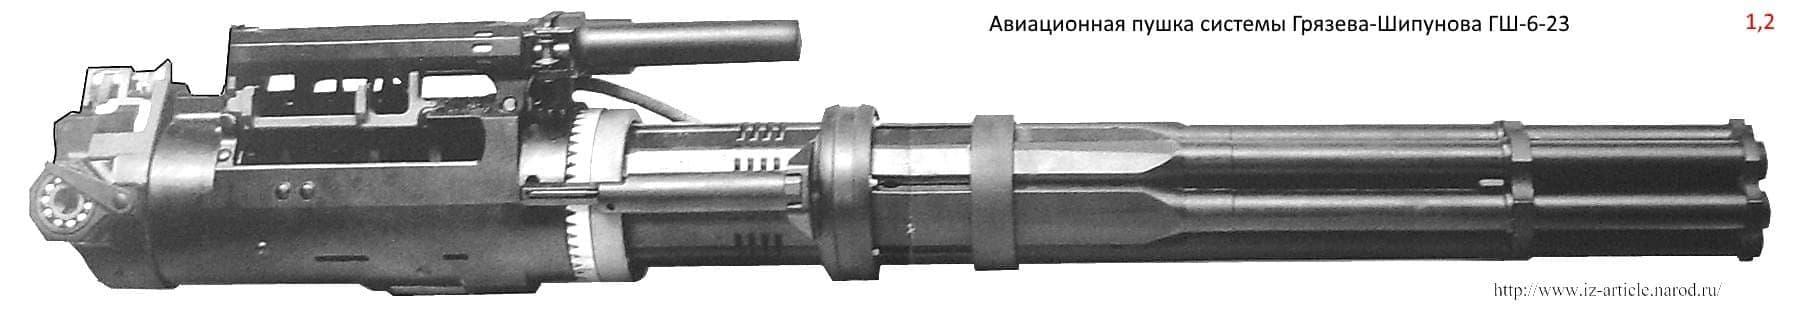 Авиационная пушка ГШ-6-23 Грязева-Шипунова. Оружие Ижевска.